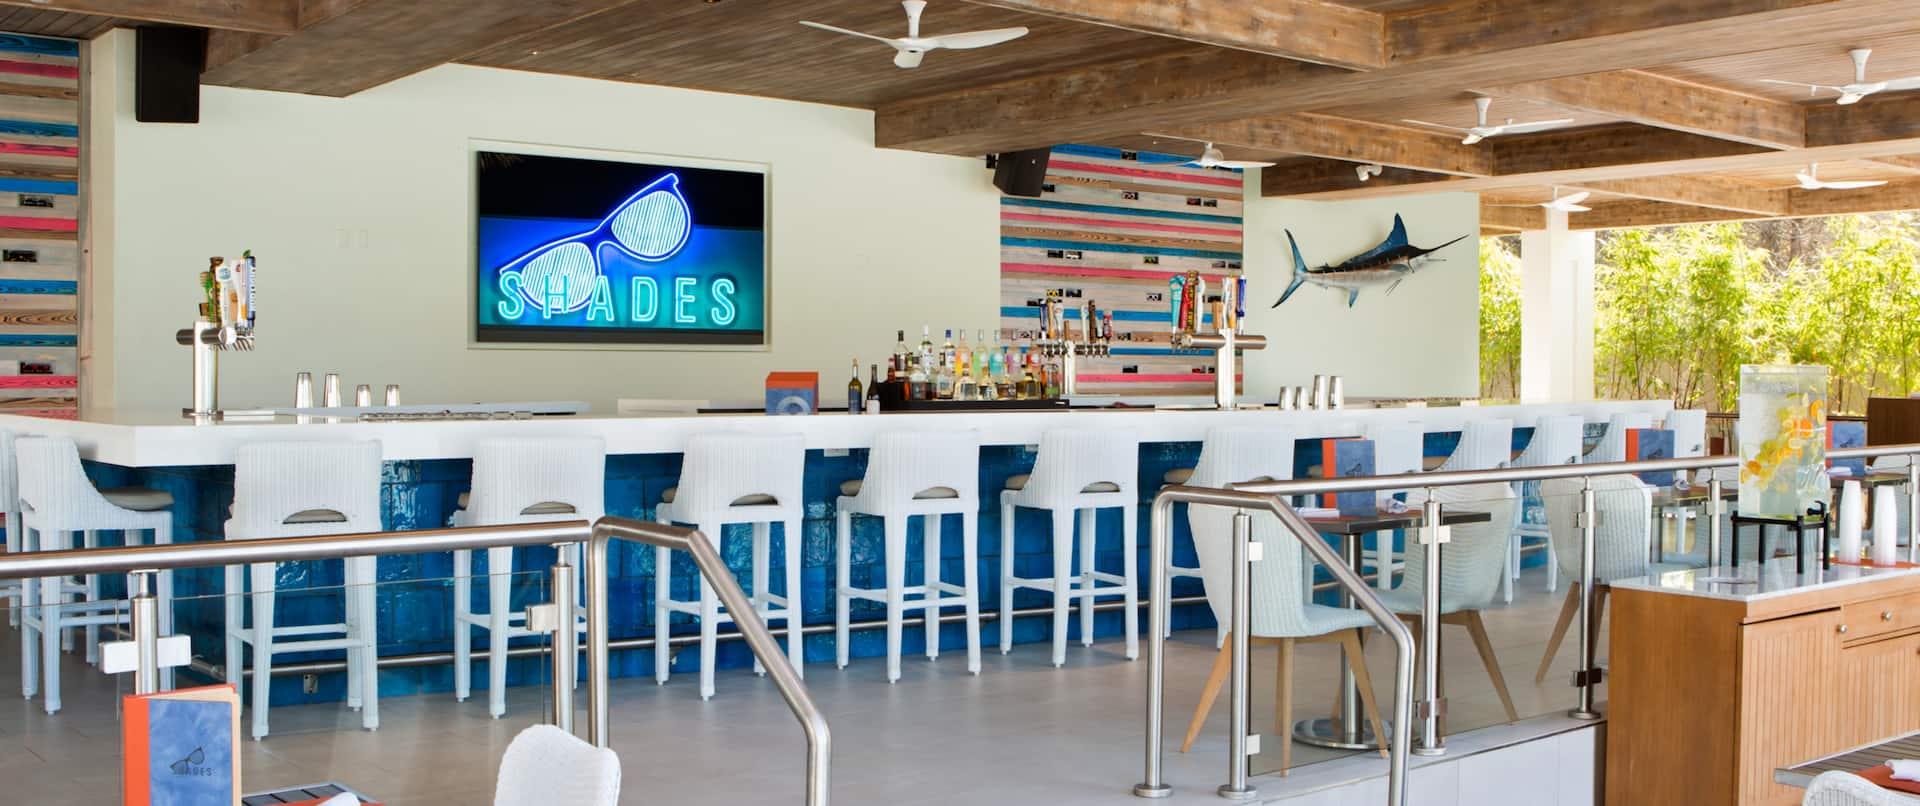 Shades Restaurant